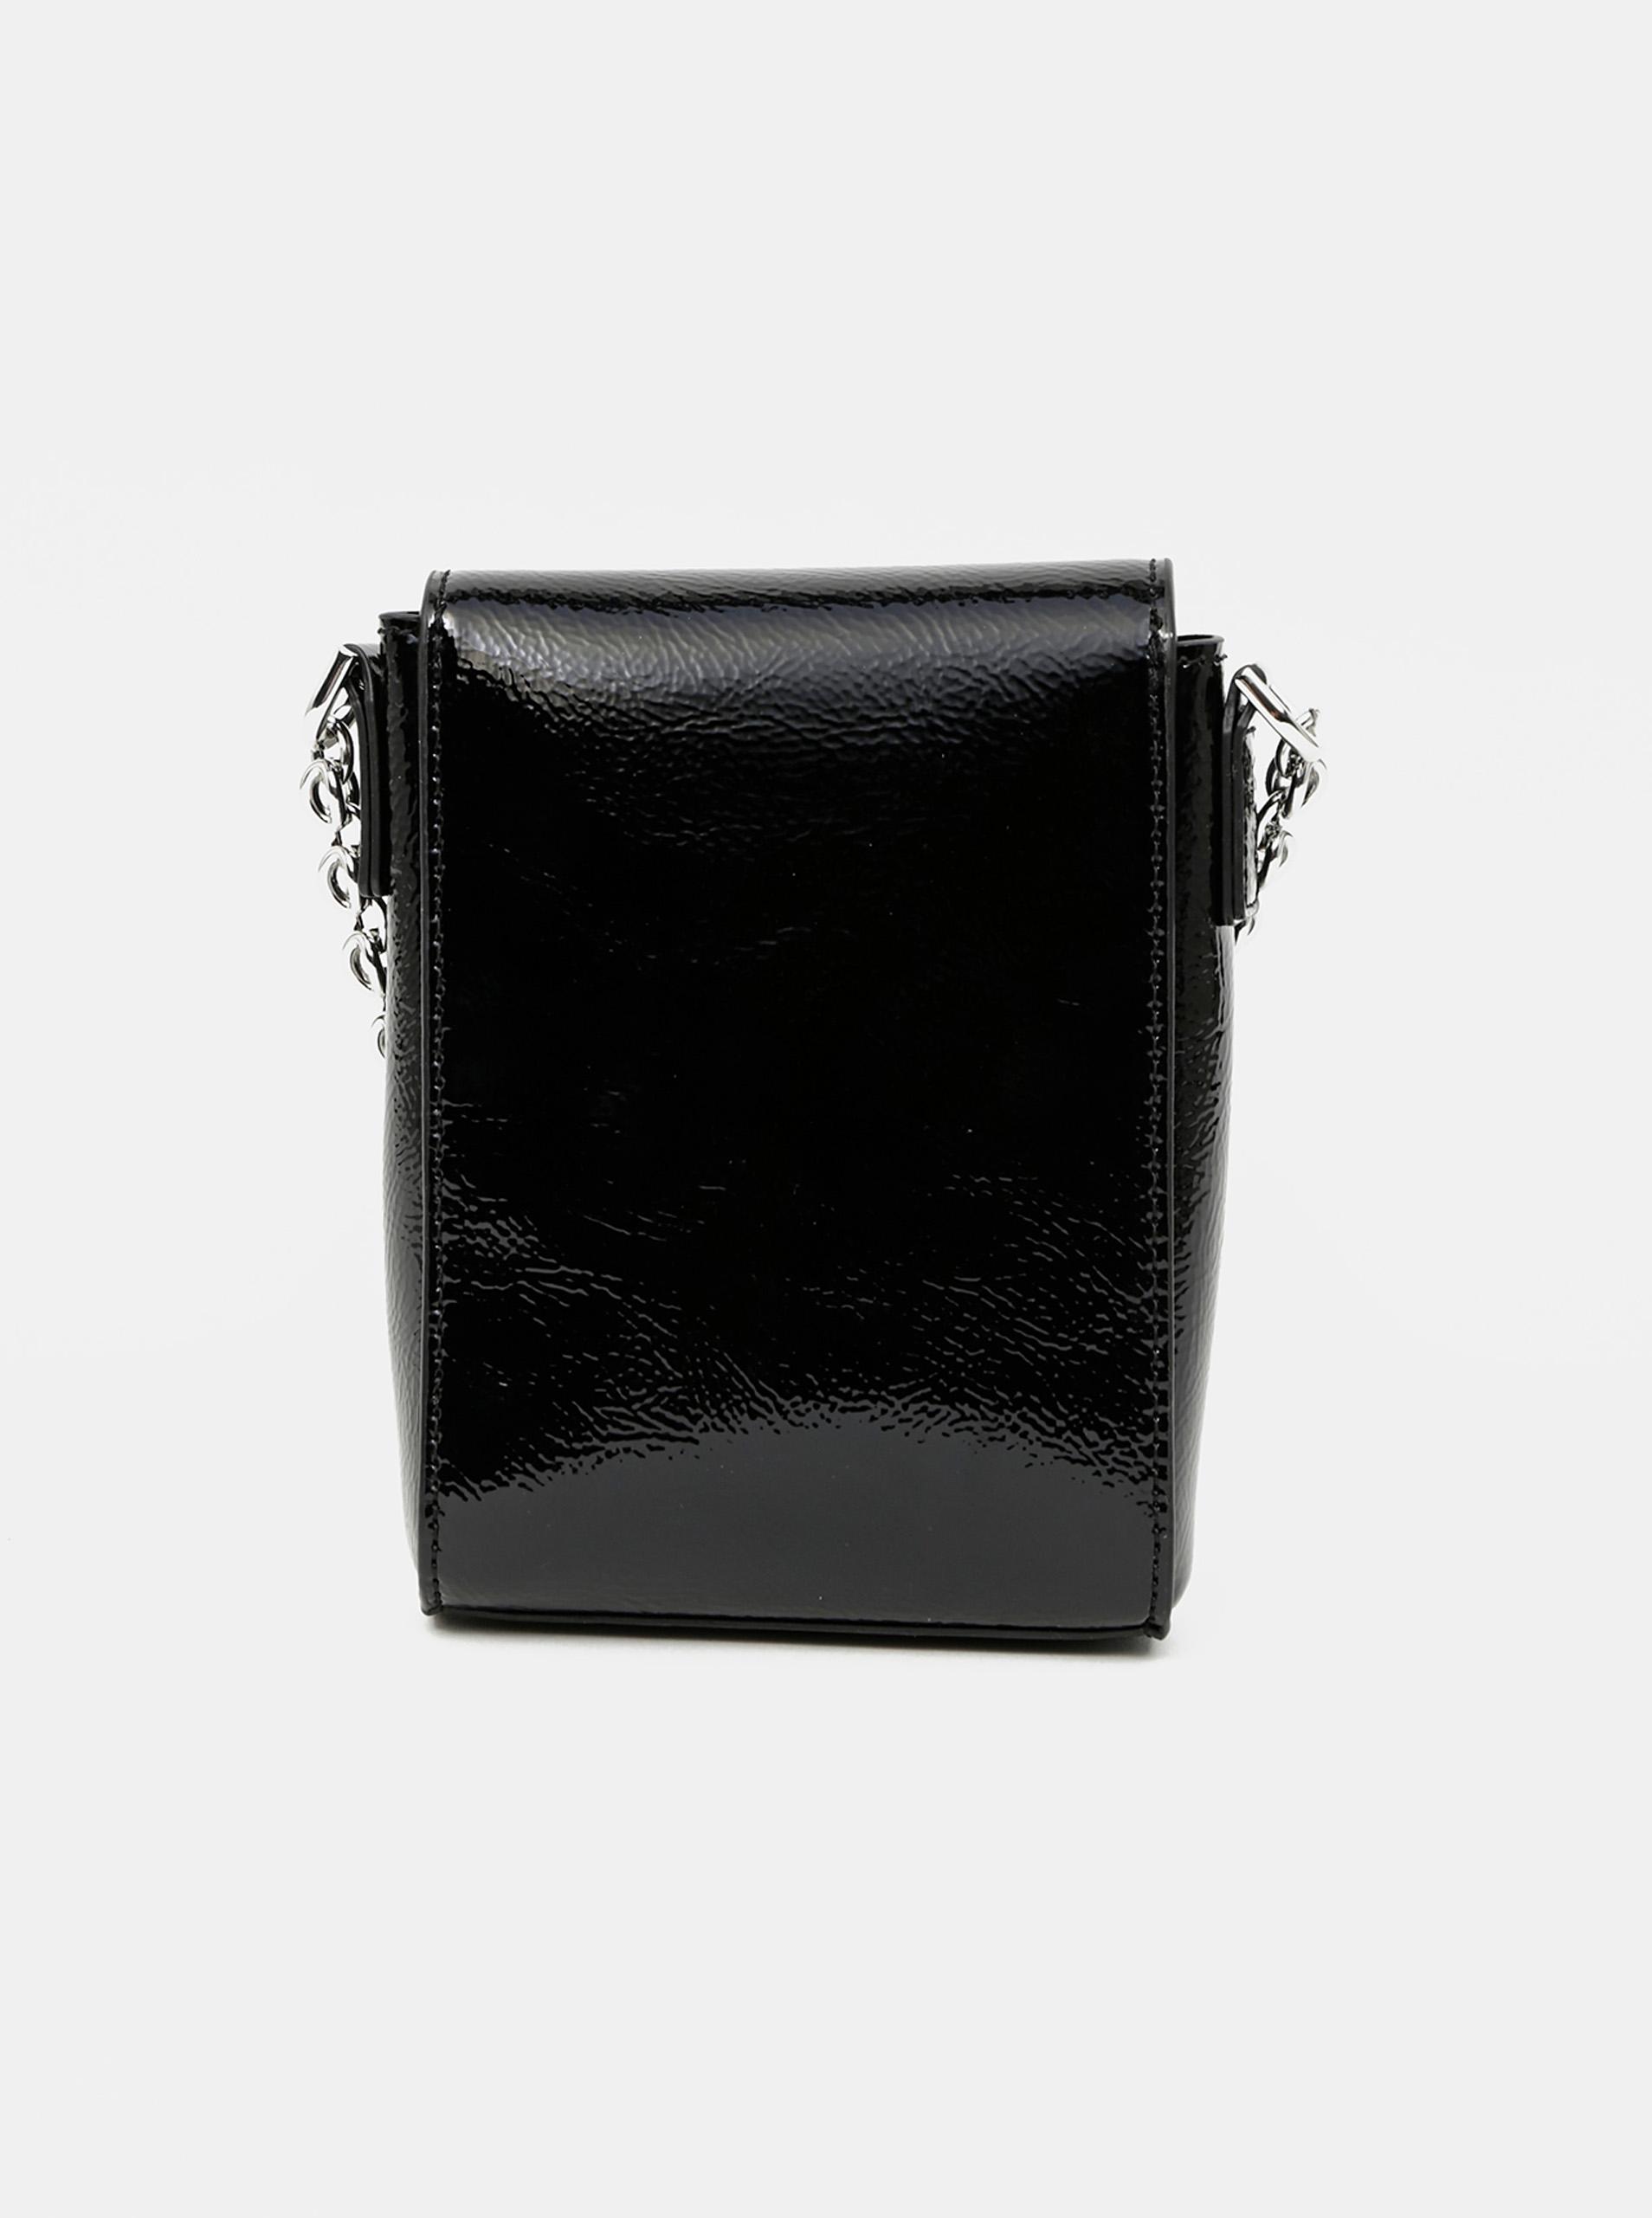 Calvin Klein black crossbody small handbag